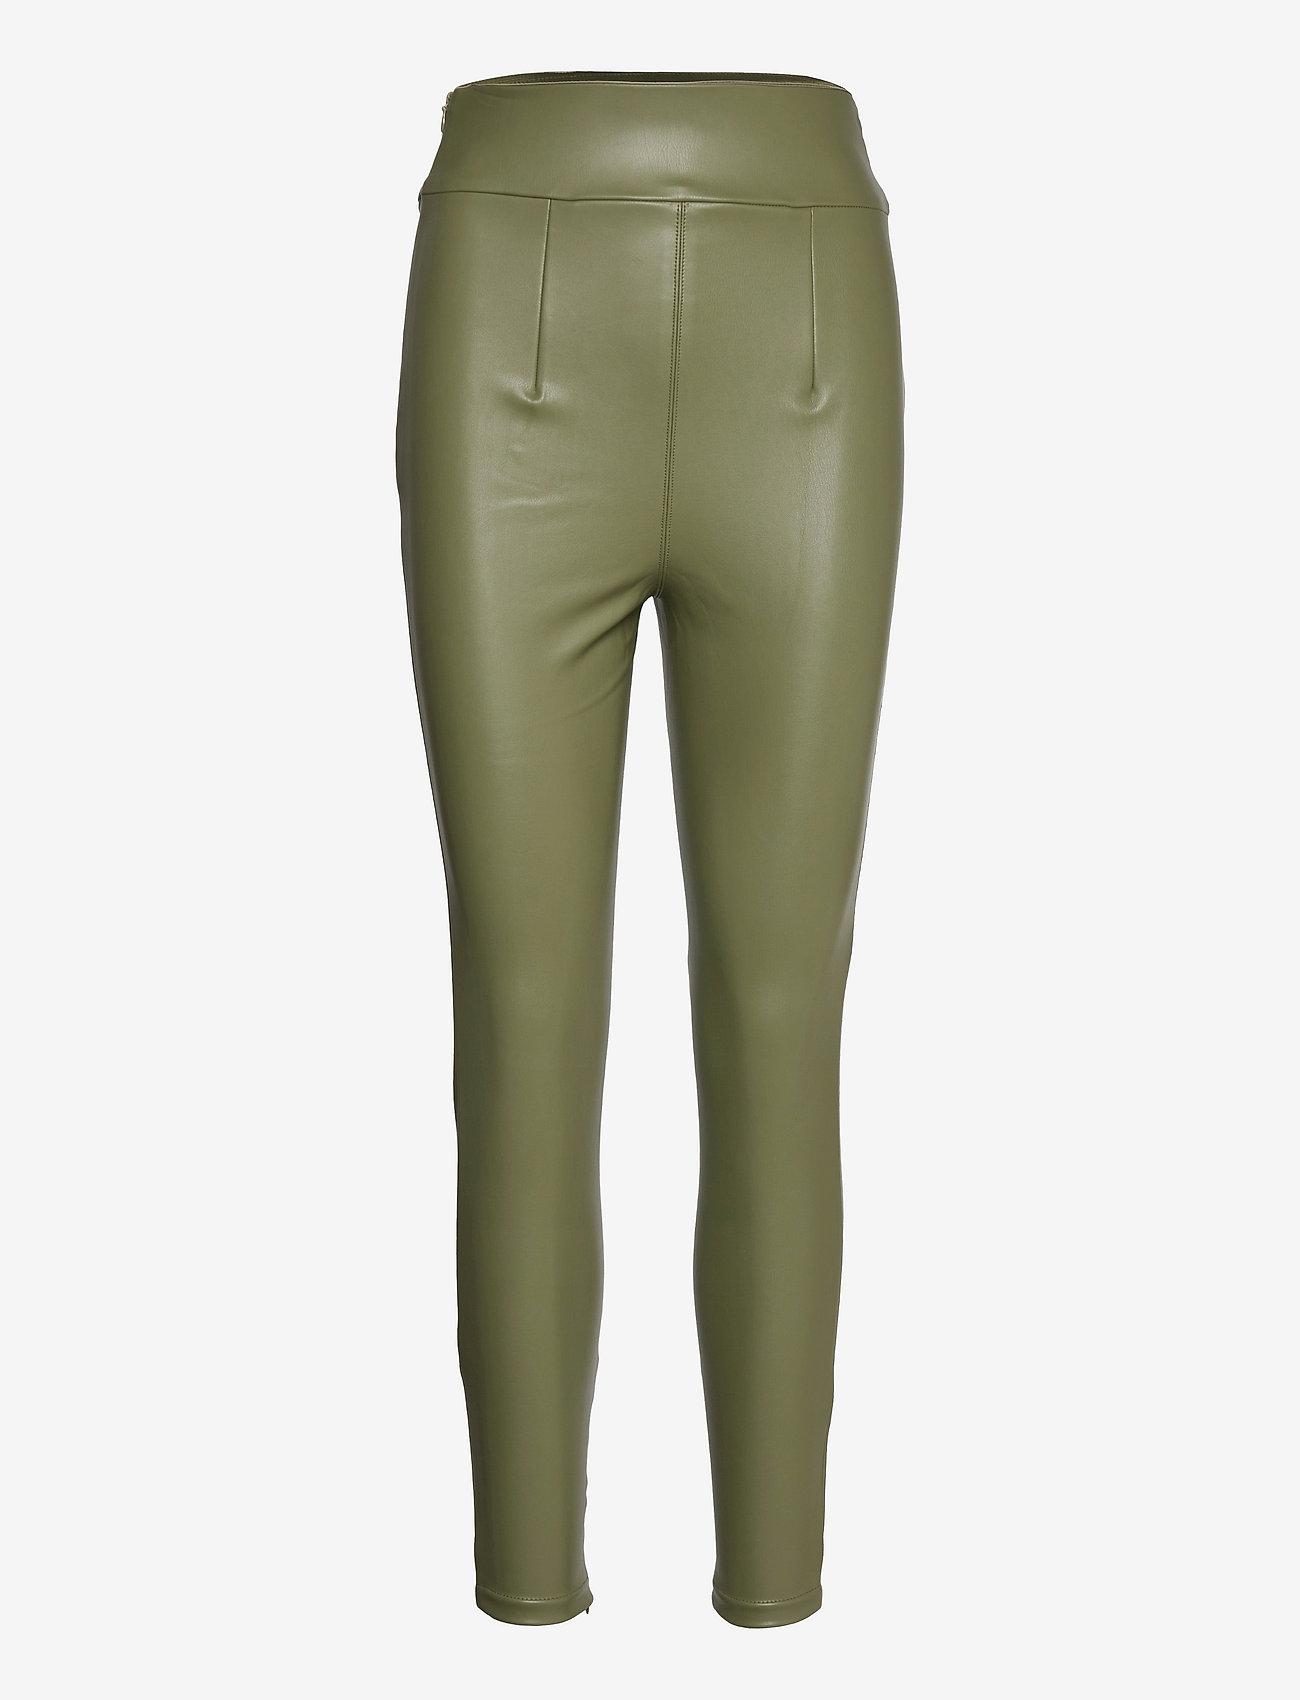 GUESS Jeans - PRISCILLA LEGGINGS - skinnbyxor - baja palm - 0